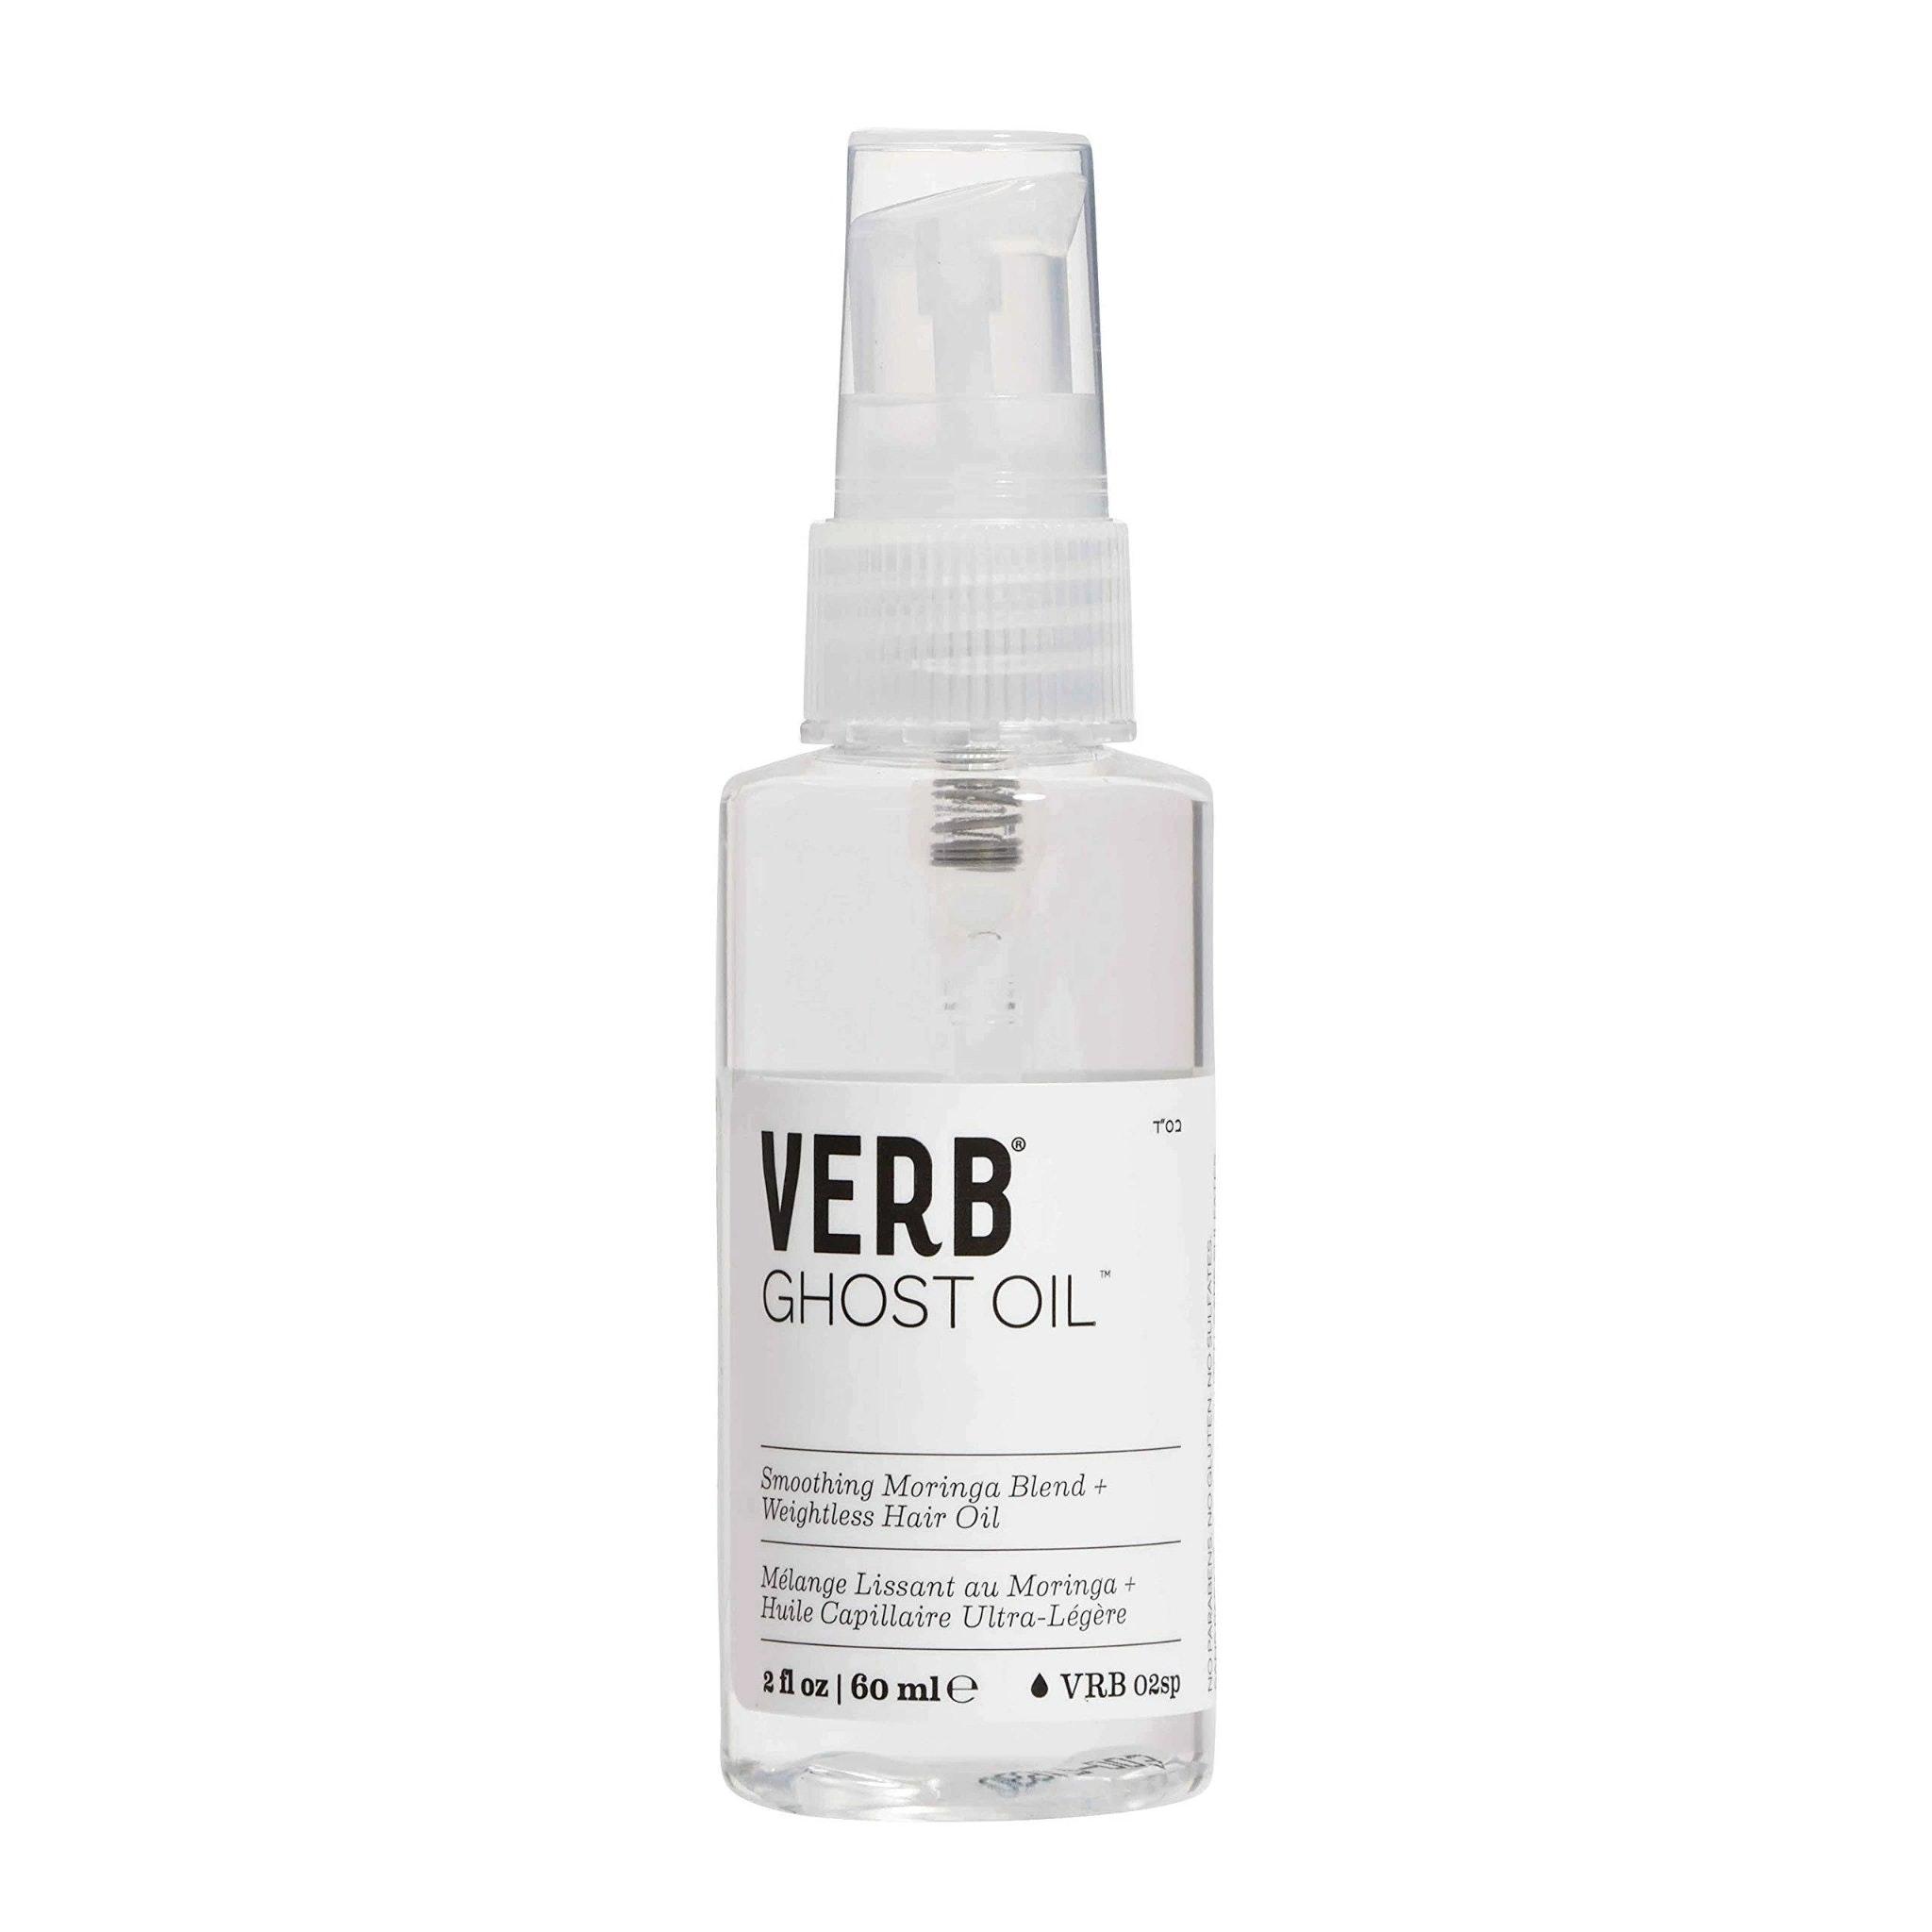 Verb's Ghost Weightless Hair Oil